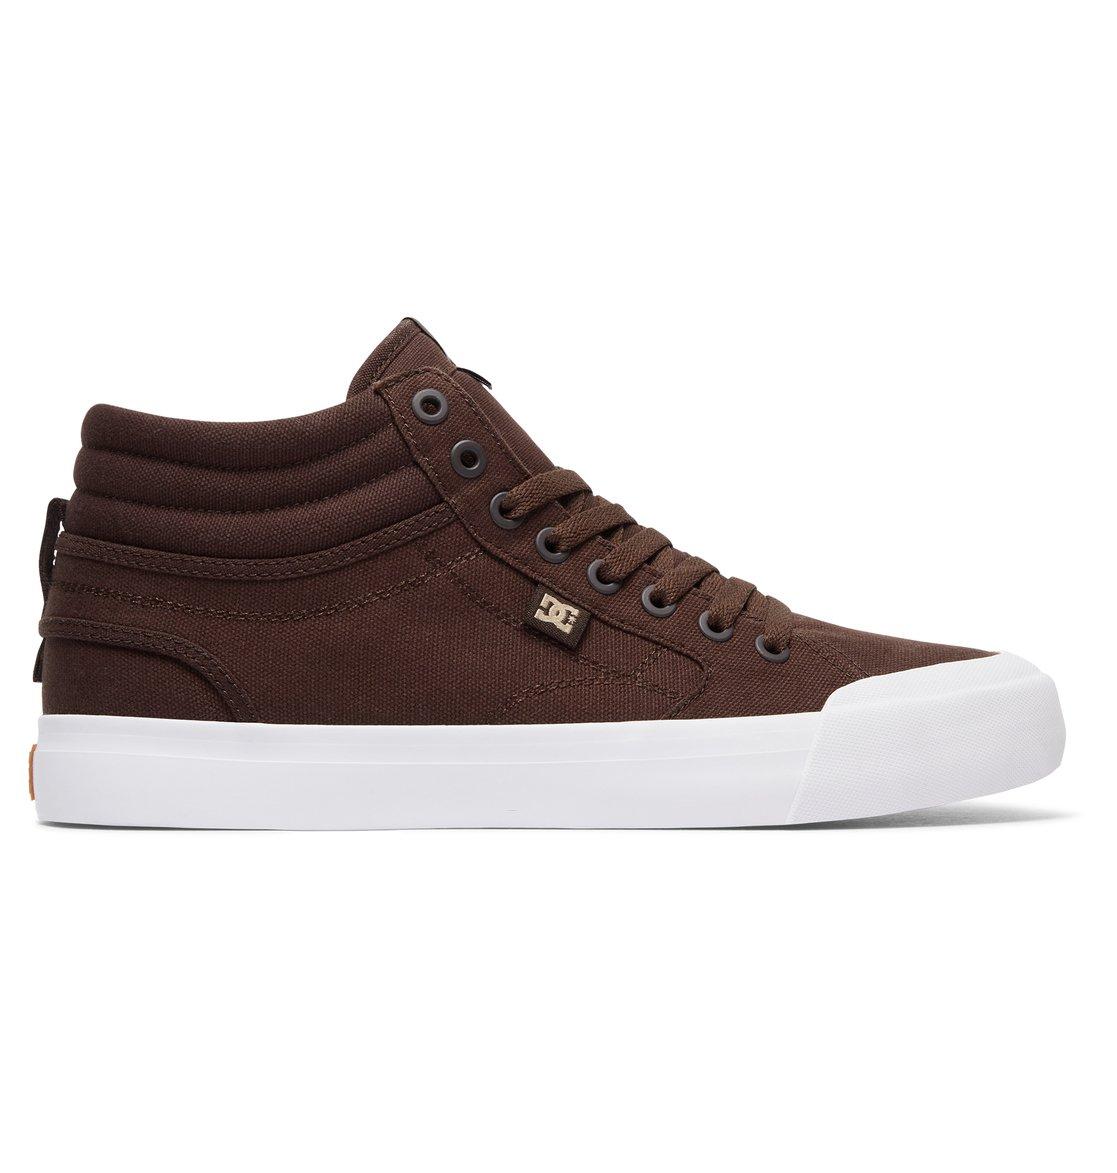 DC Shoes Evan Smith Hi Chaussure Homme Noir Taille 42.5 fW2JZMtwS4